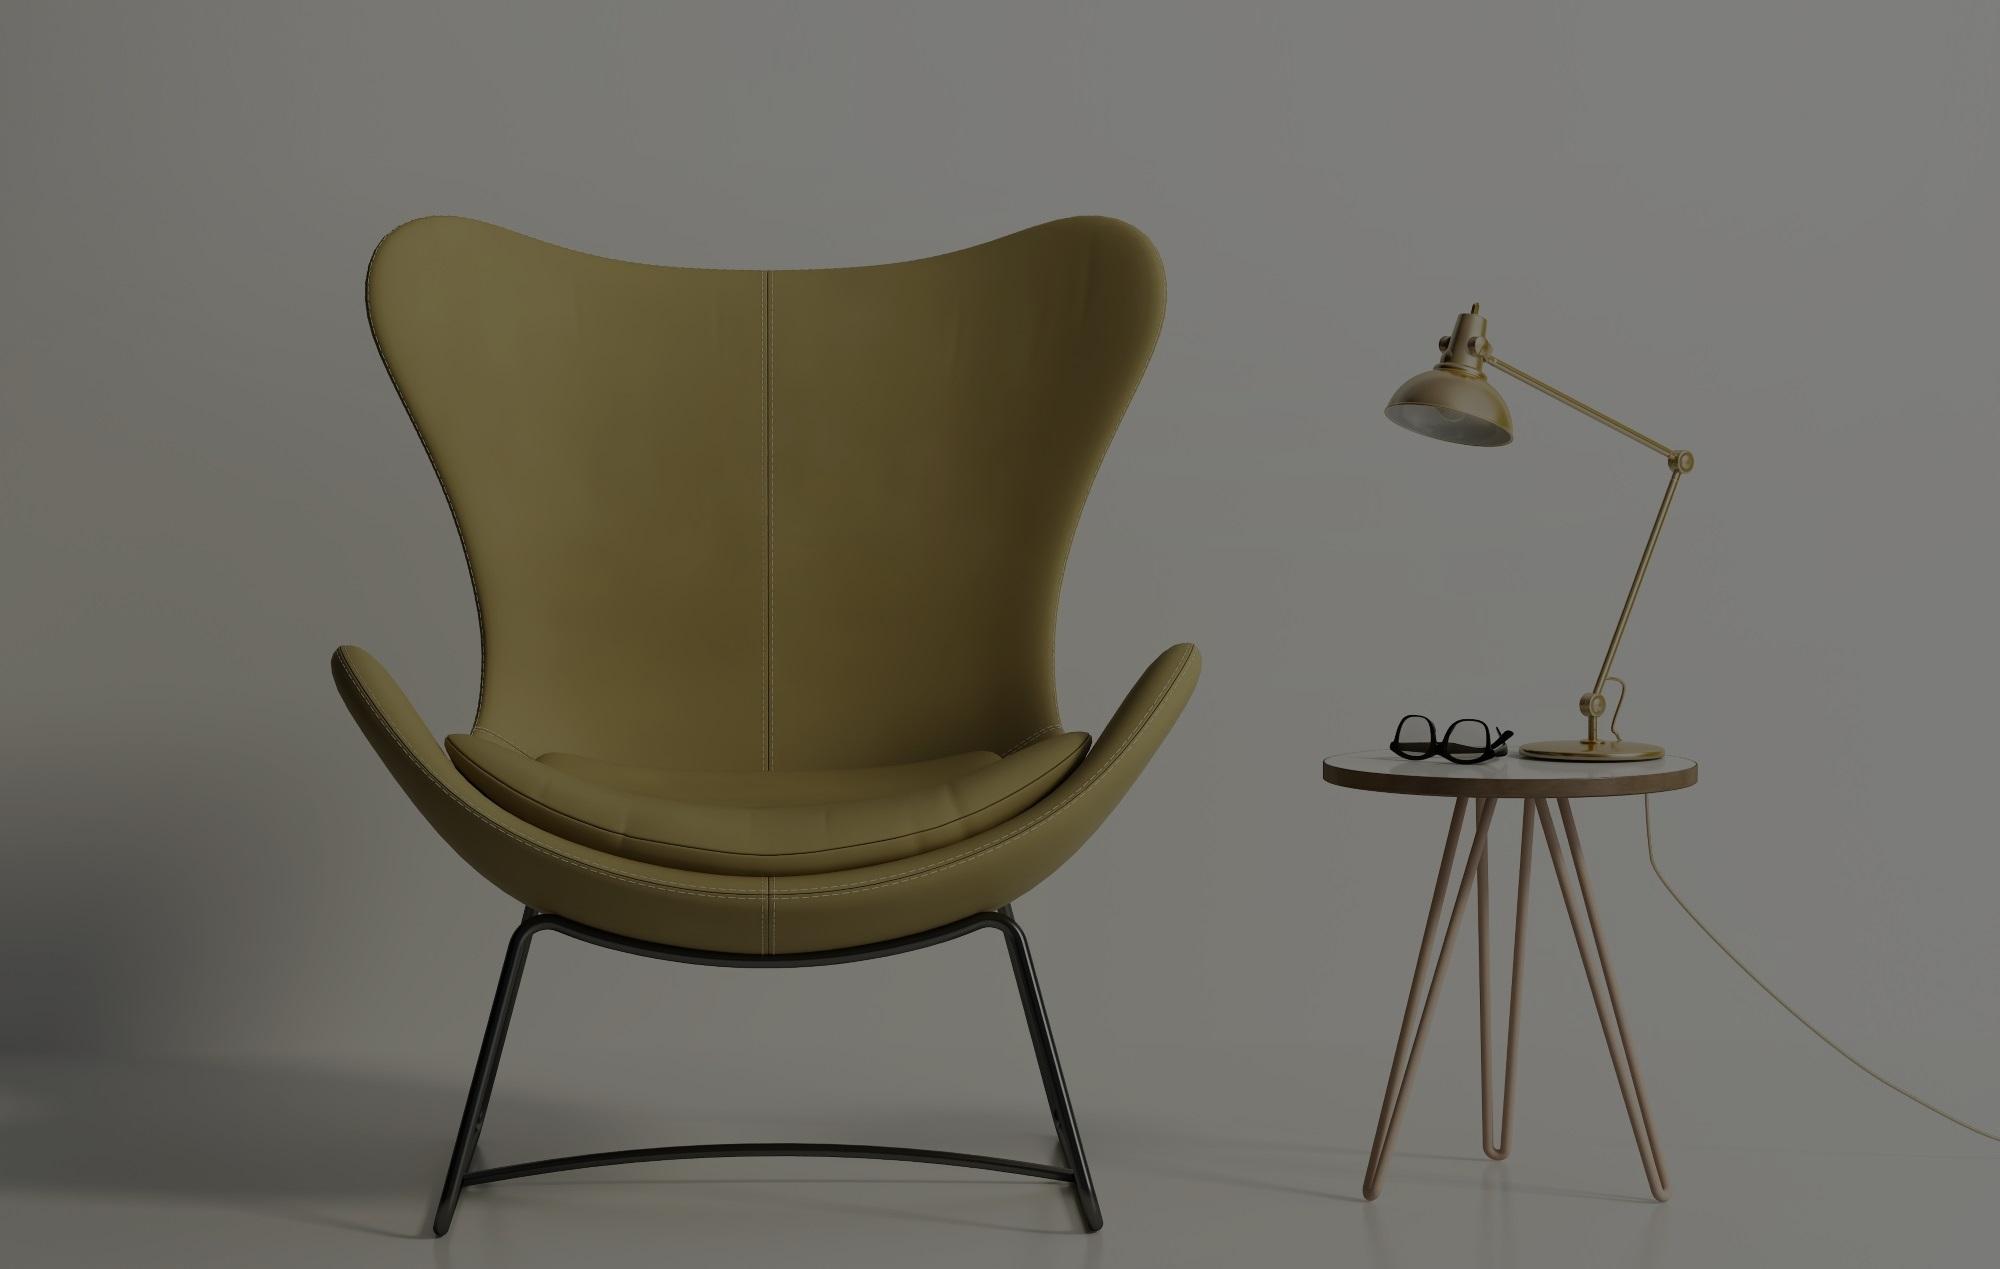 stuhl reparieren excellent medium size of stuhl reparieren luxus kunstleder sofa reparieren. Black Bedroom Furniture Sets. Home Design Ideas